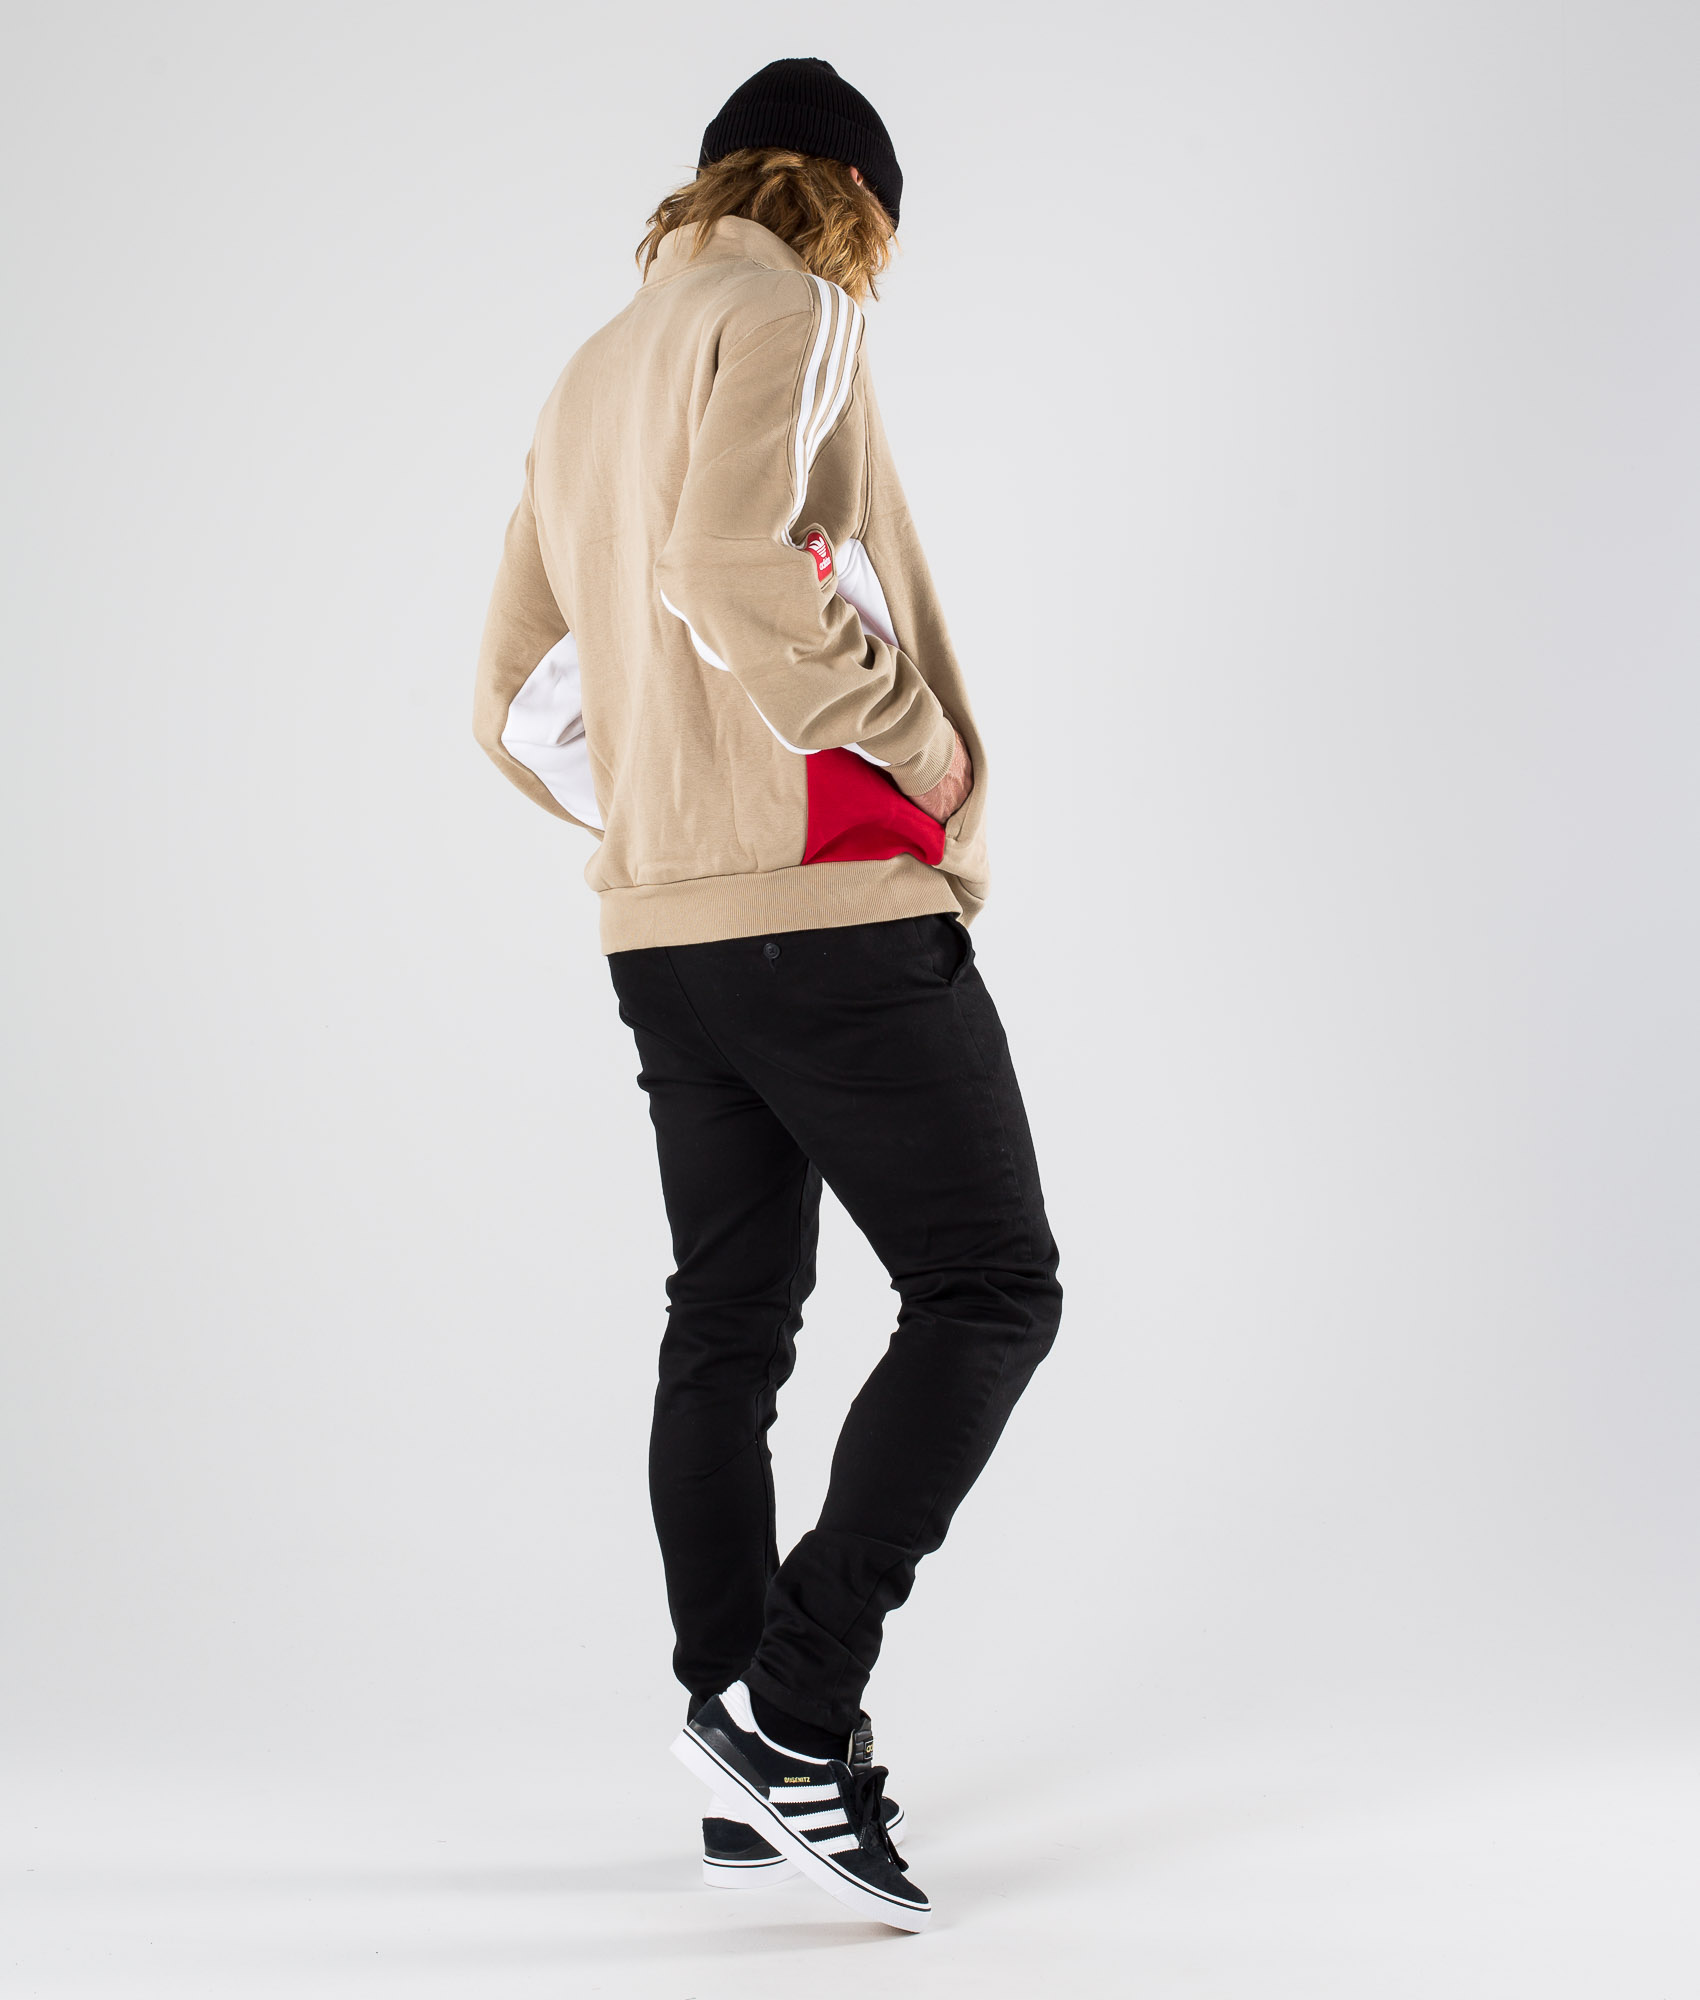 Adidas Skateboarding Modular Flc 2 Felpa HempWhitePower Red